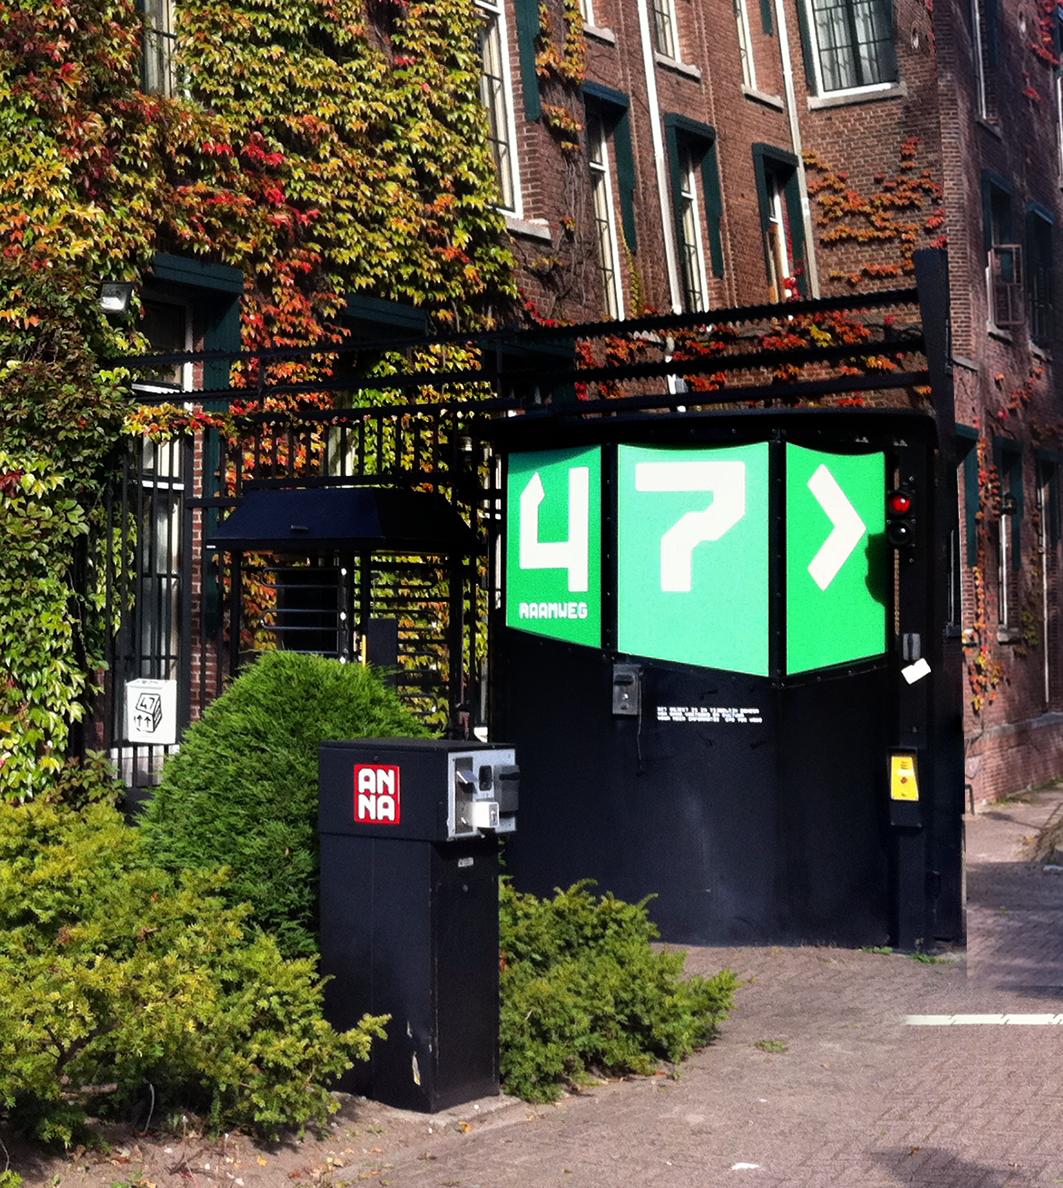 Raamweg 47, voormalig Europol gebouw © Roos Berendsen